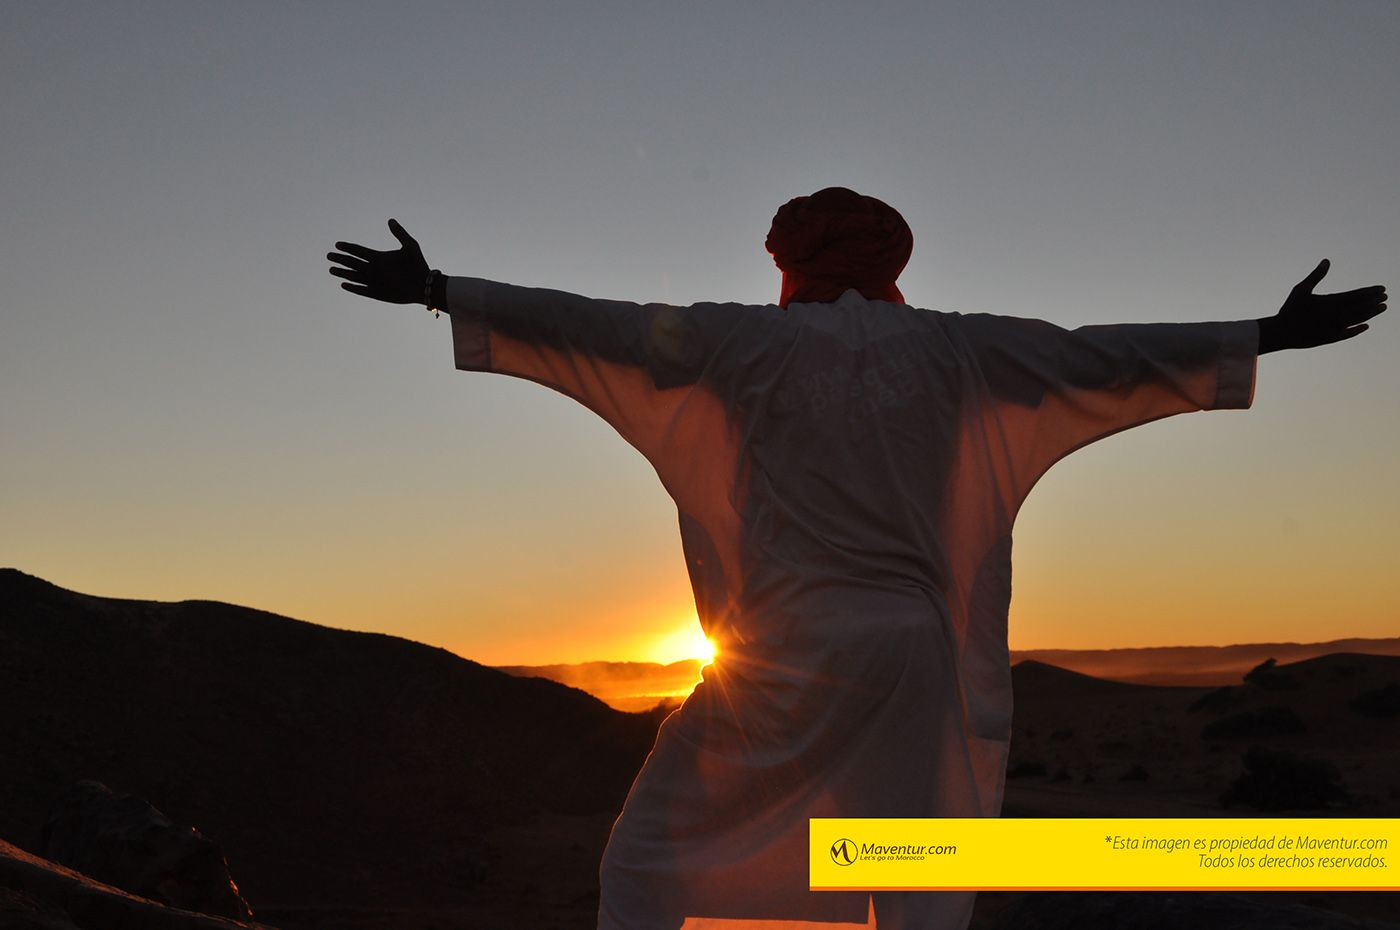 excursión-mifis-nomadas-pueblos-khamlia-oasis-hassilabied-merzouga-dunas-4x4-aventura-maventur